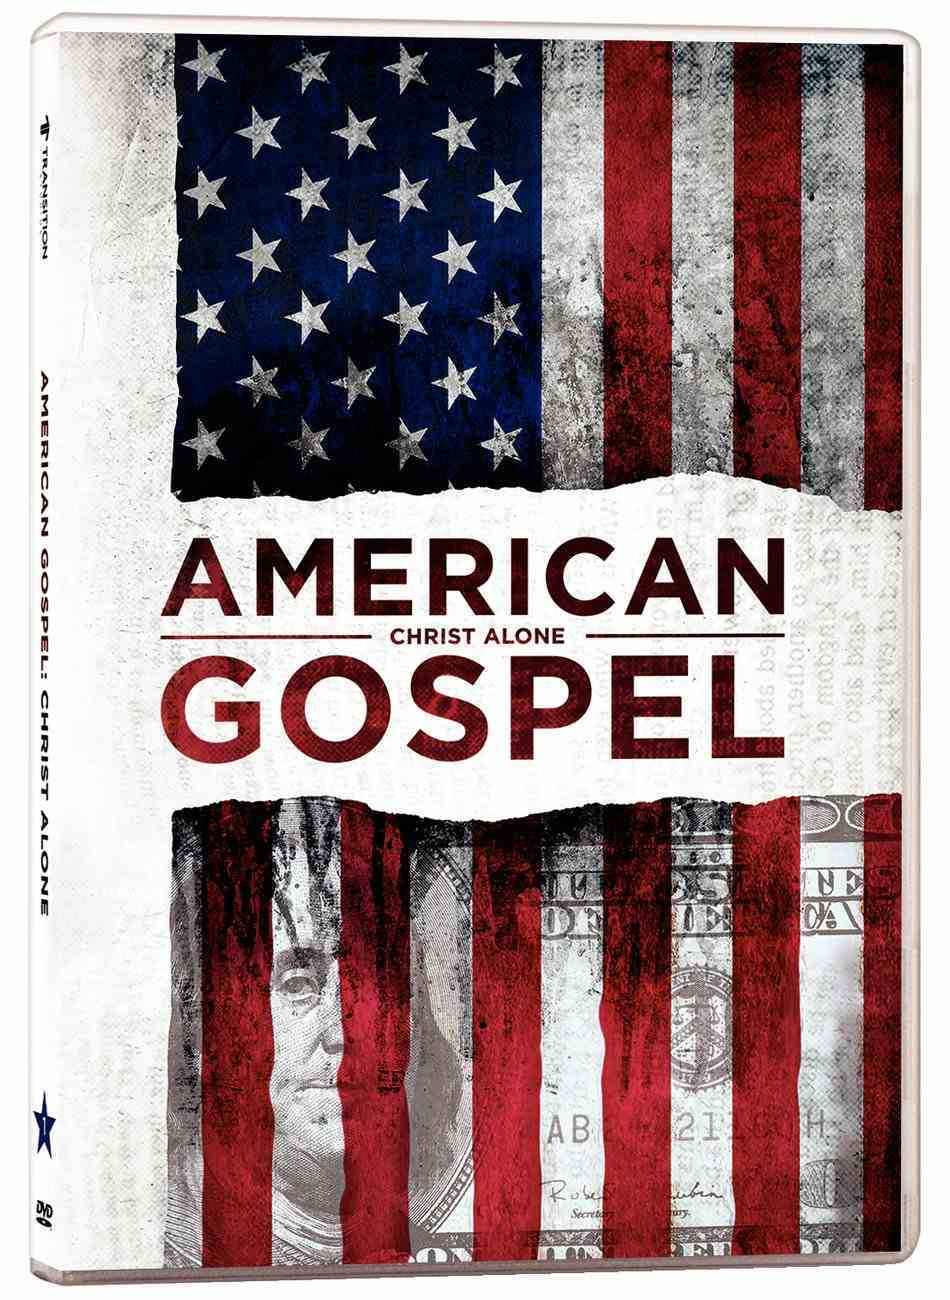 American Gospel: Christ Alone DVD